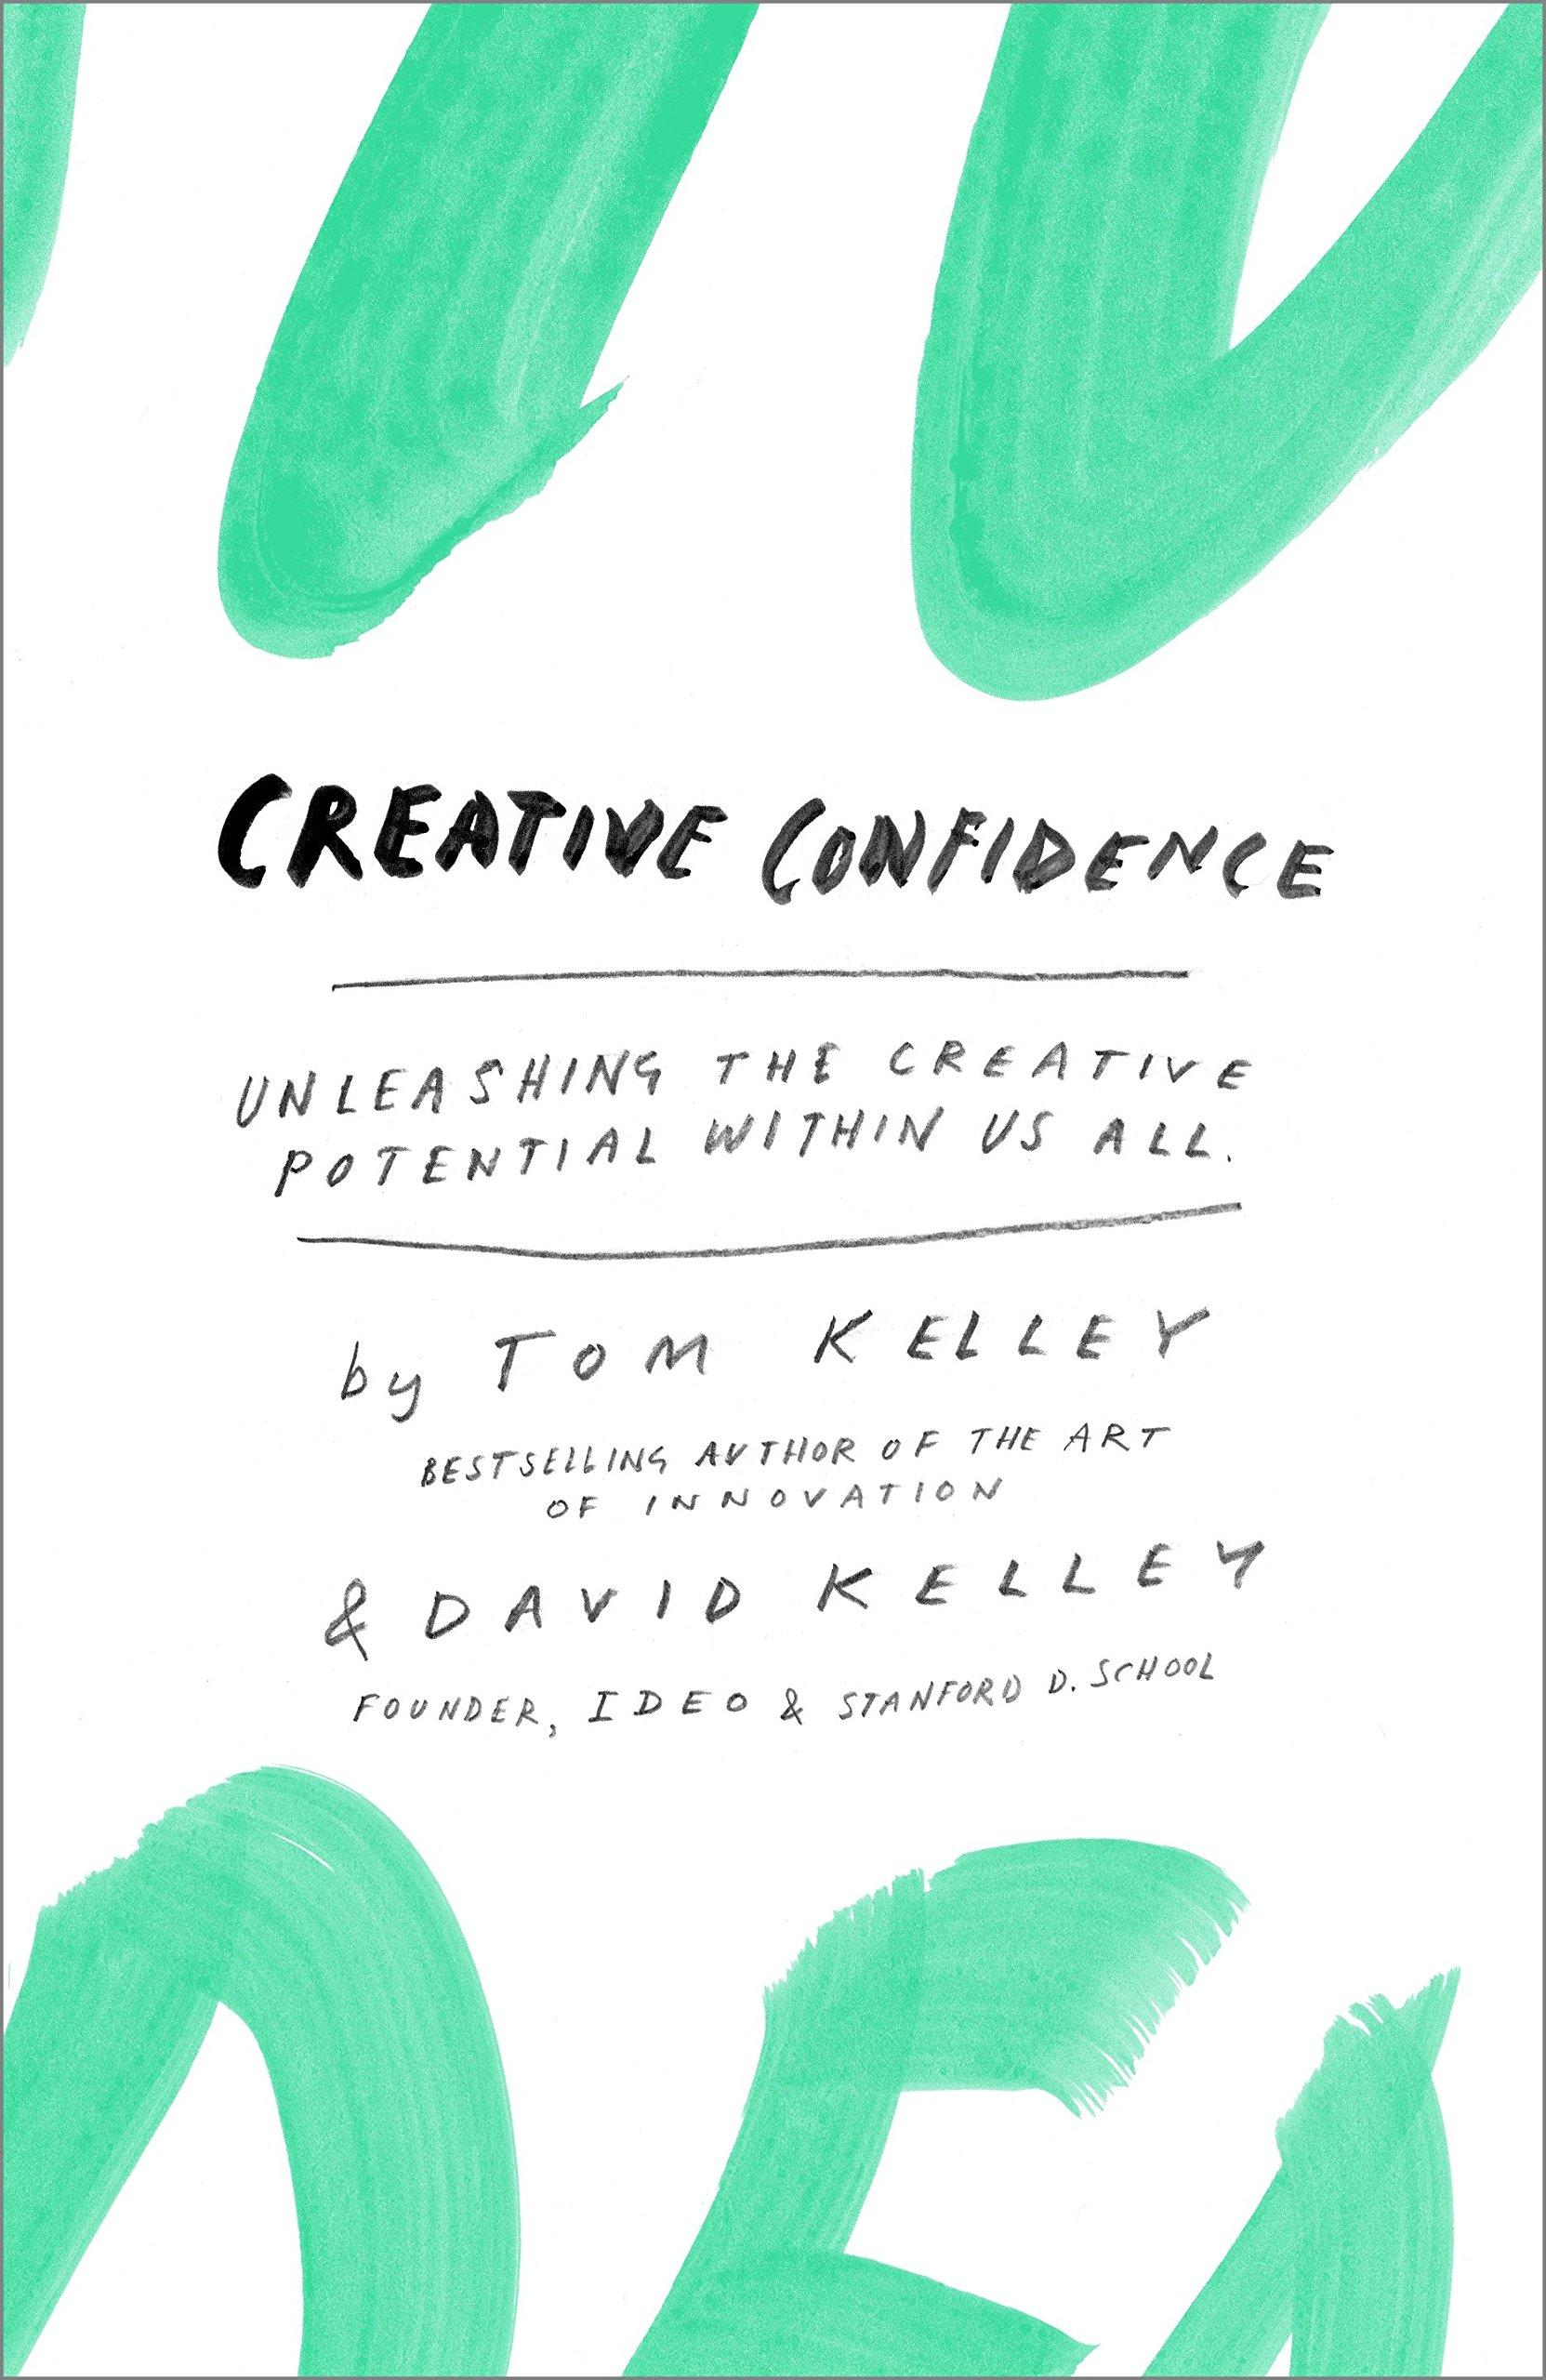 Career Books For Creatives - Creative Confidence